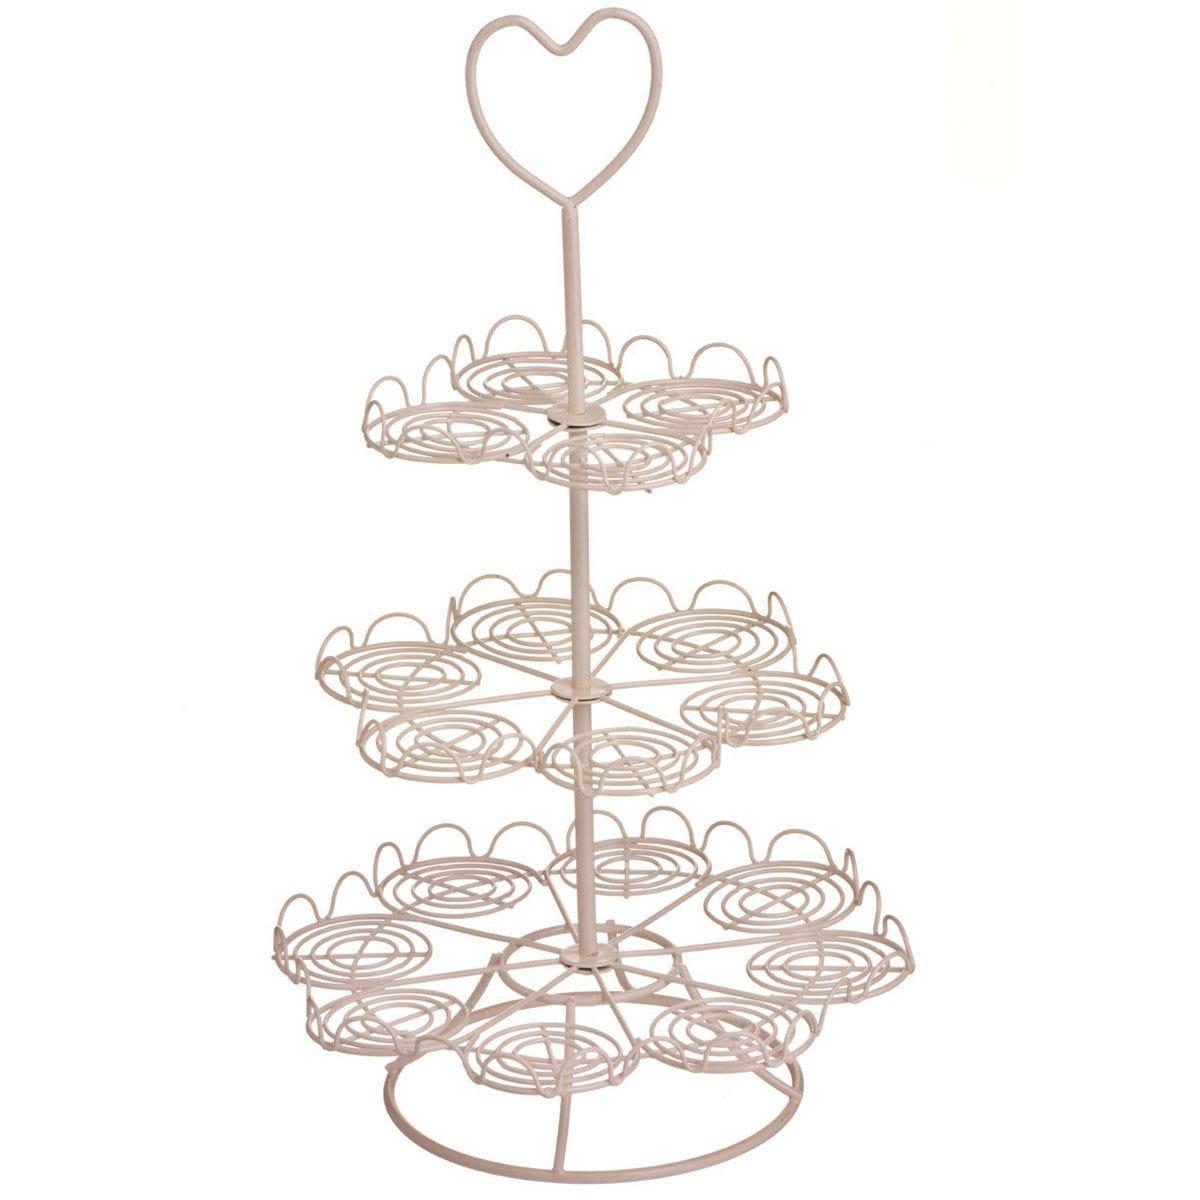 Premier Housewares 3 Tier Cupcake Stand - Cream